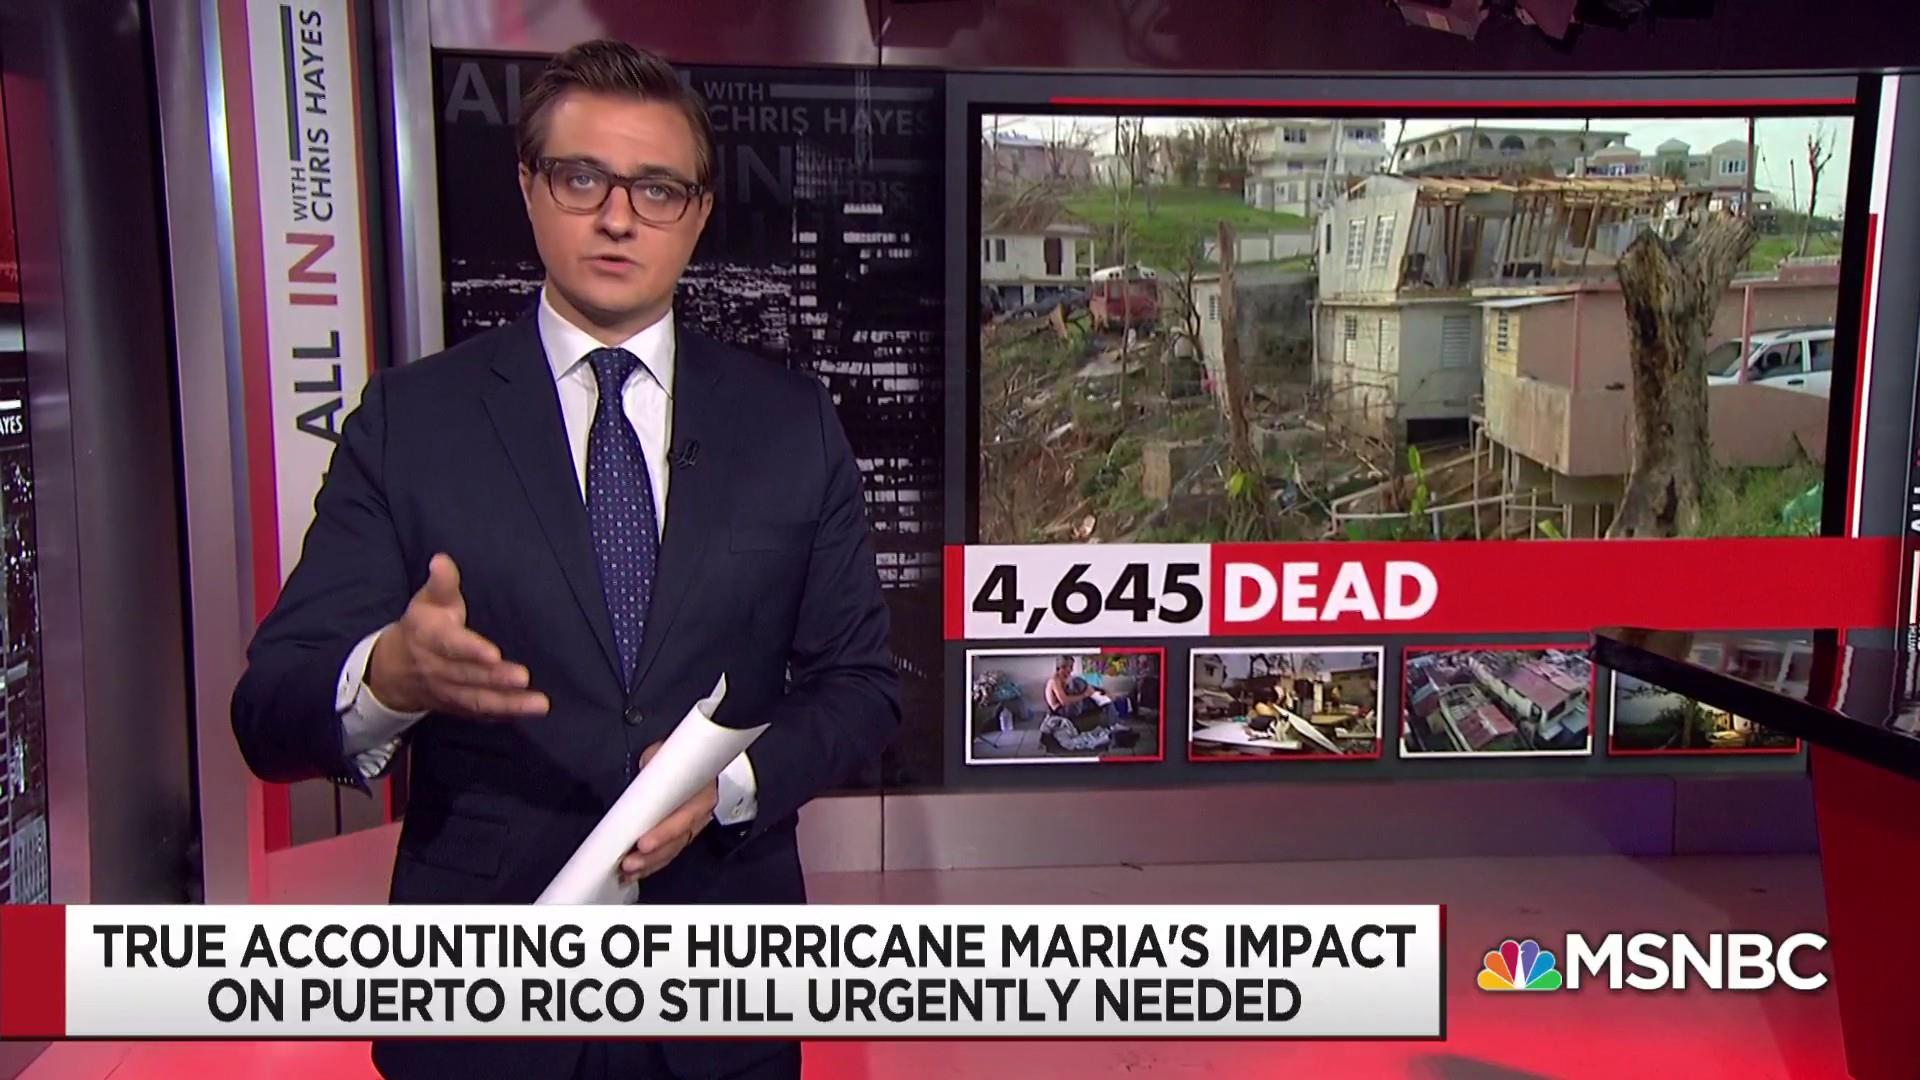 Still no full accounting for Hurricane Maria